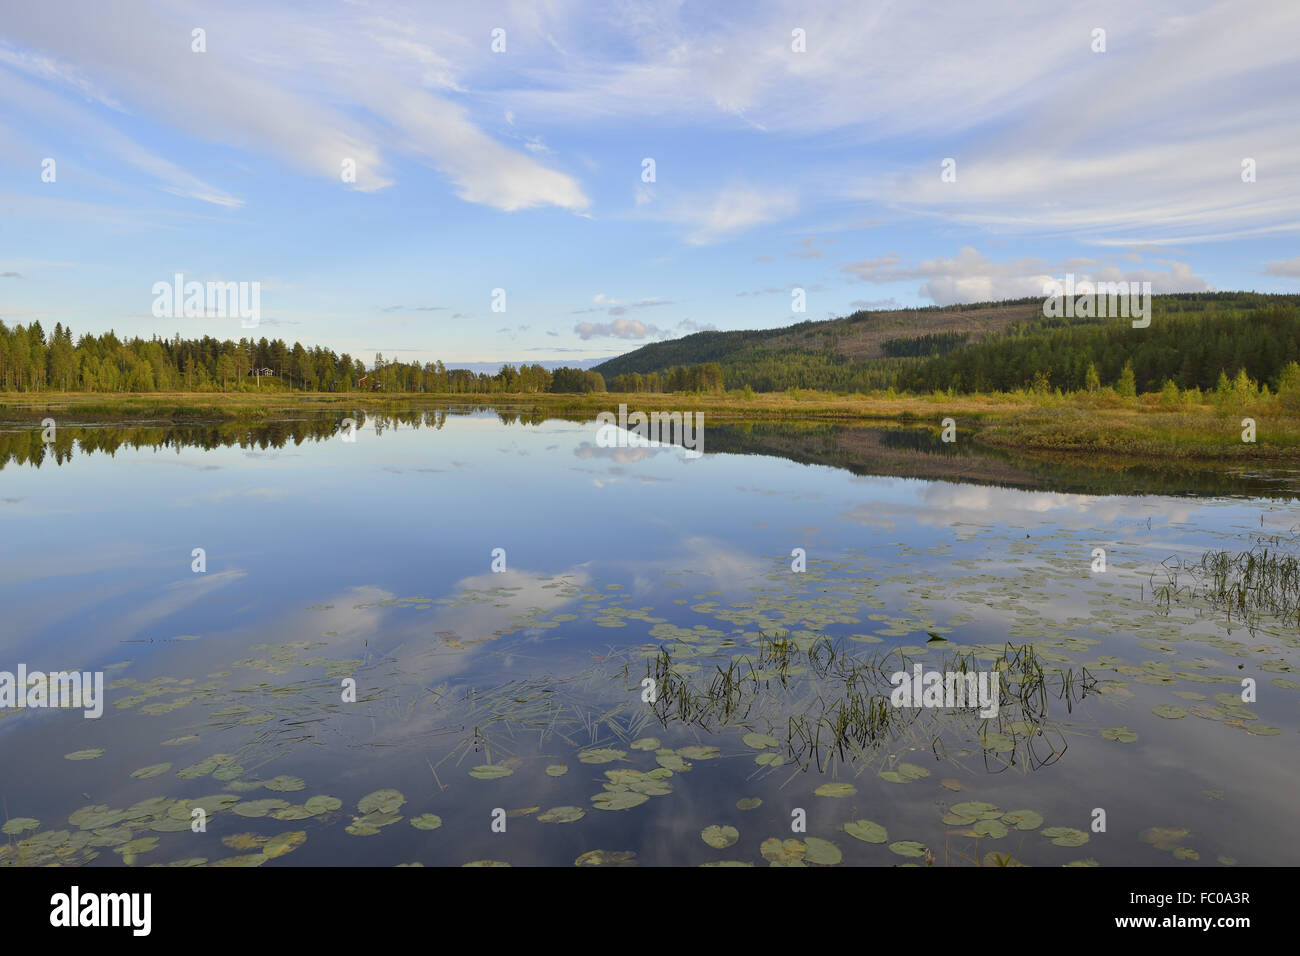 Mossatraesk Naturreservat Stock Photo